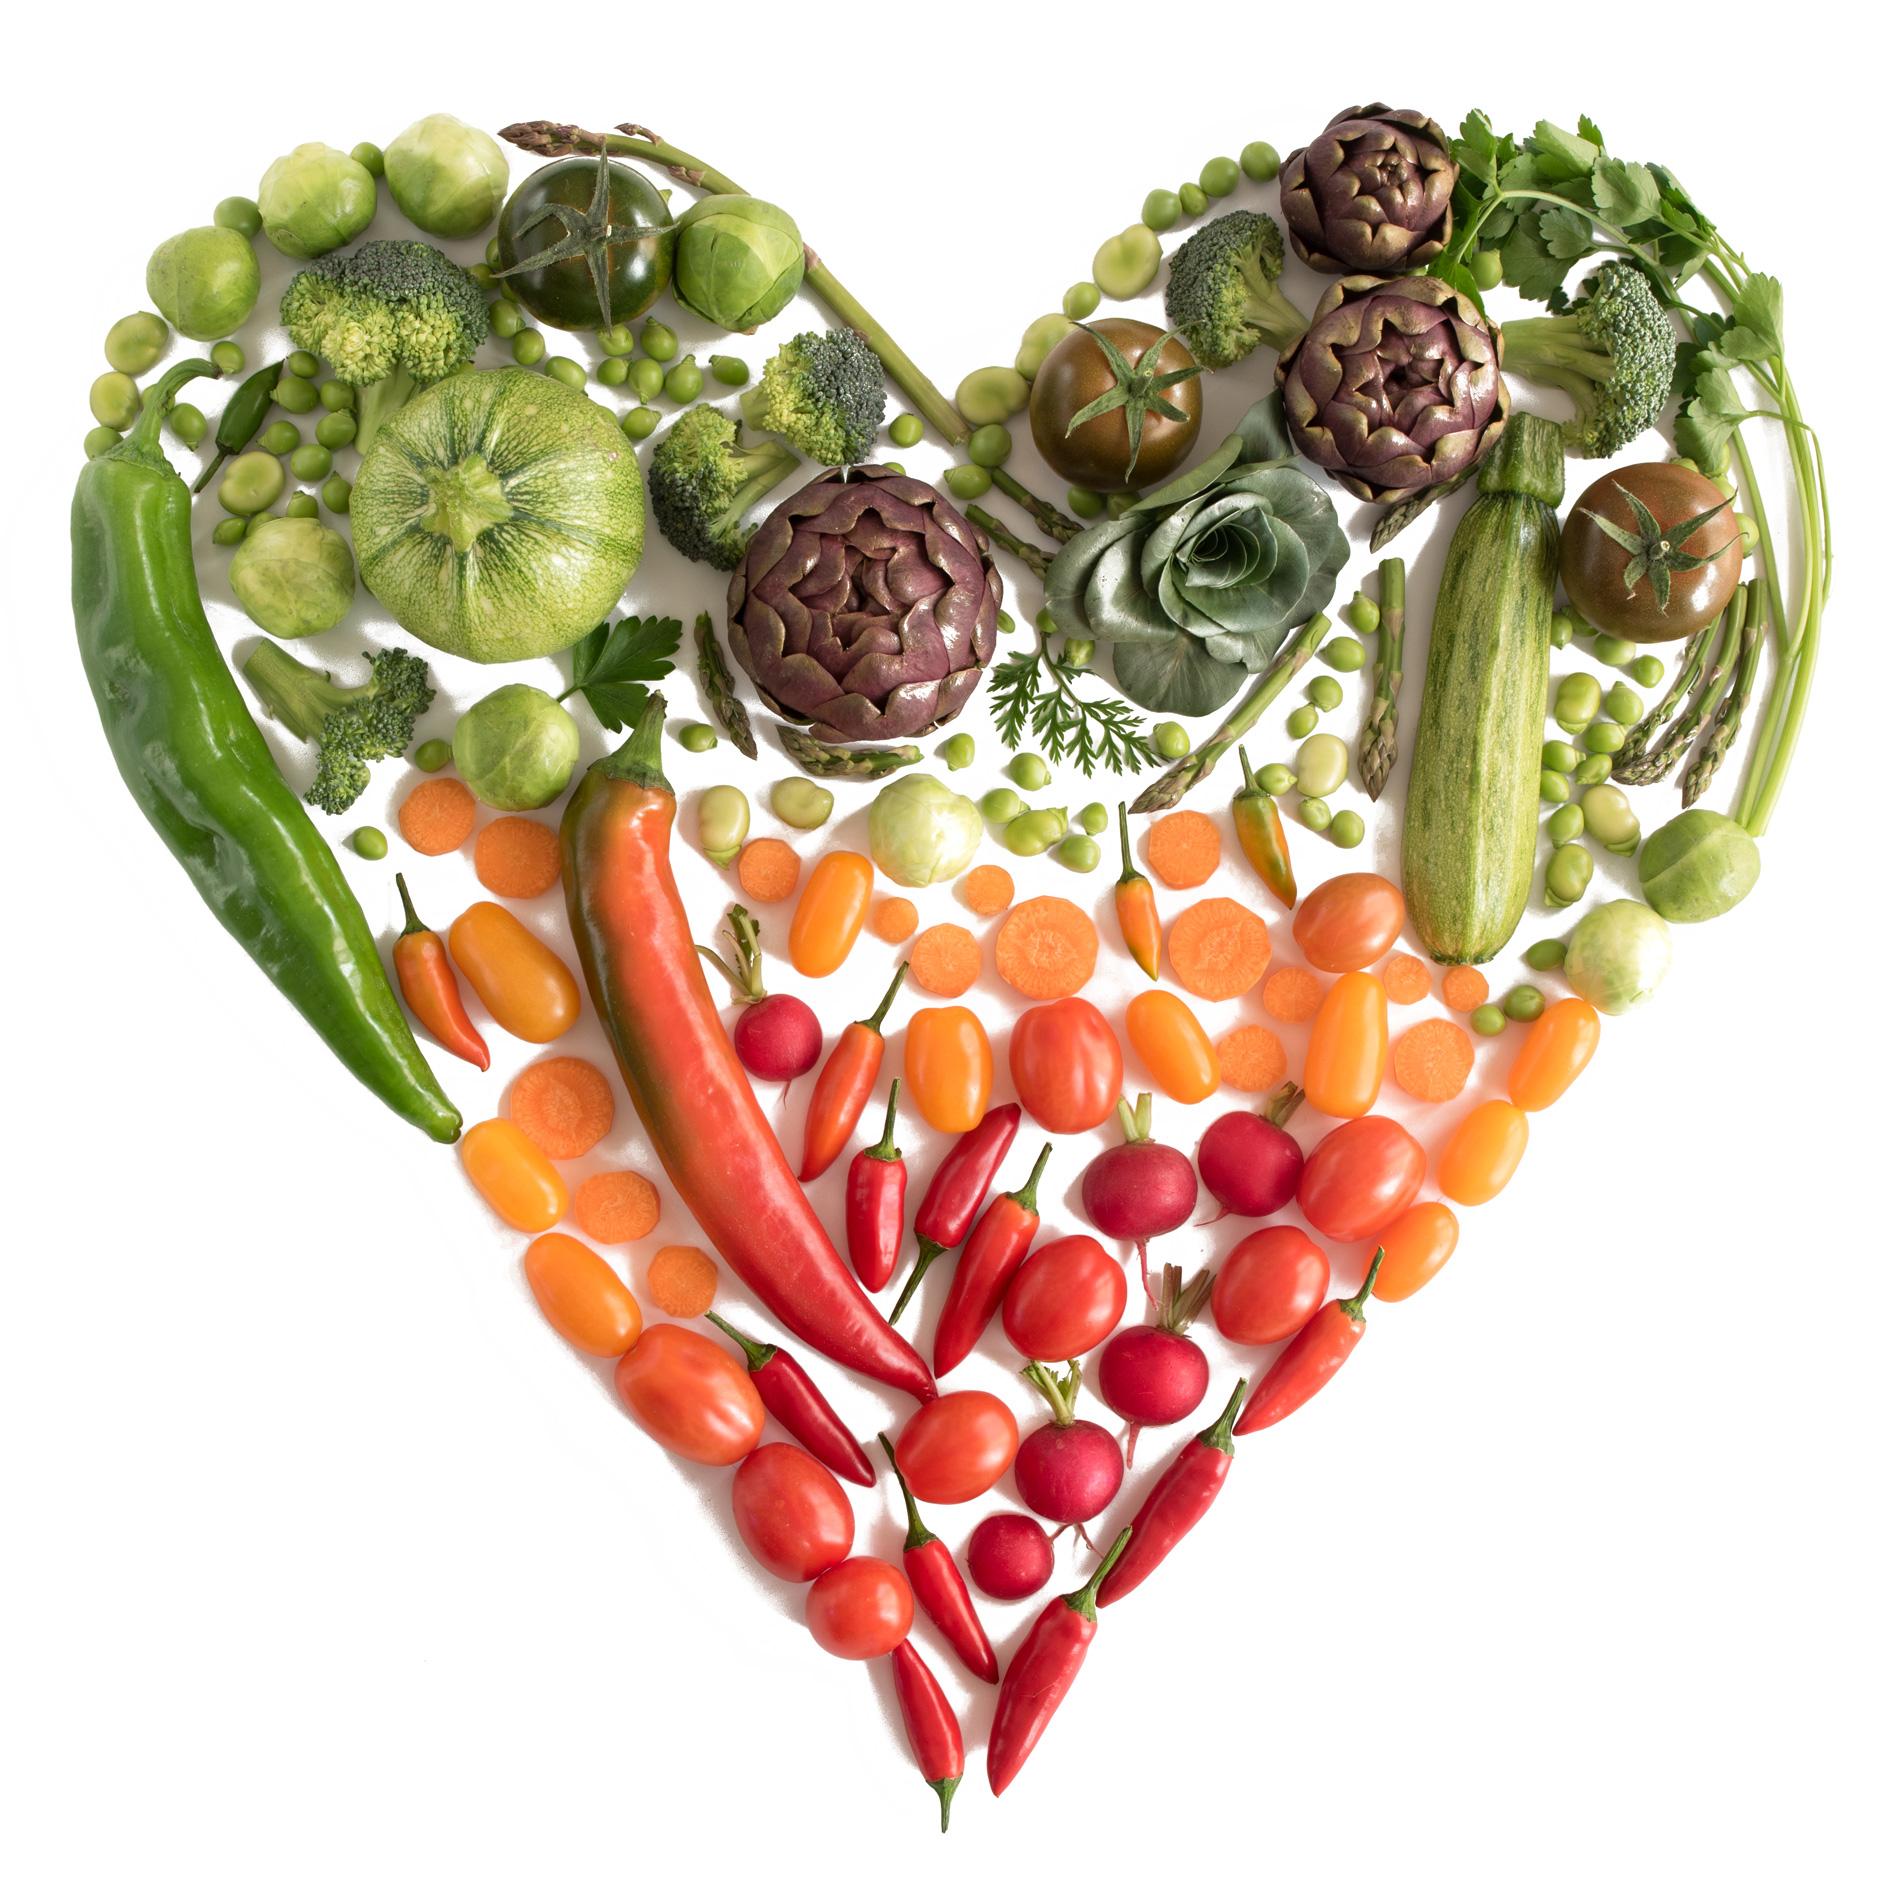 Cuore-di-verdure